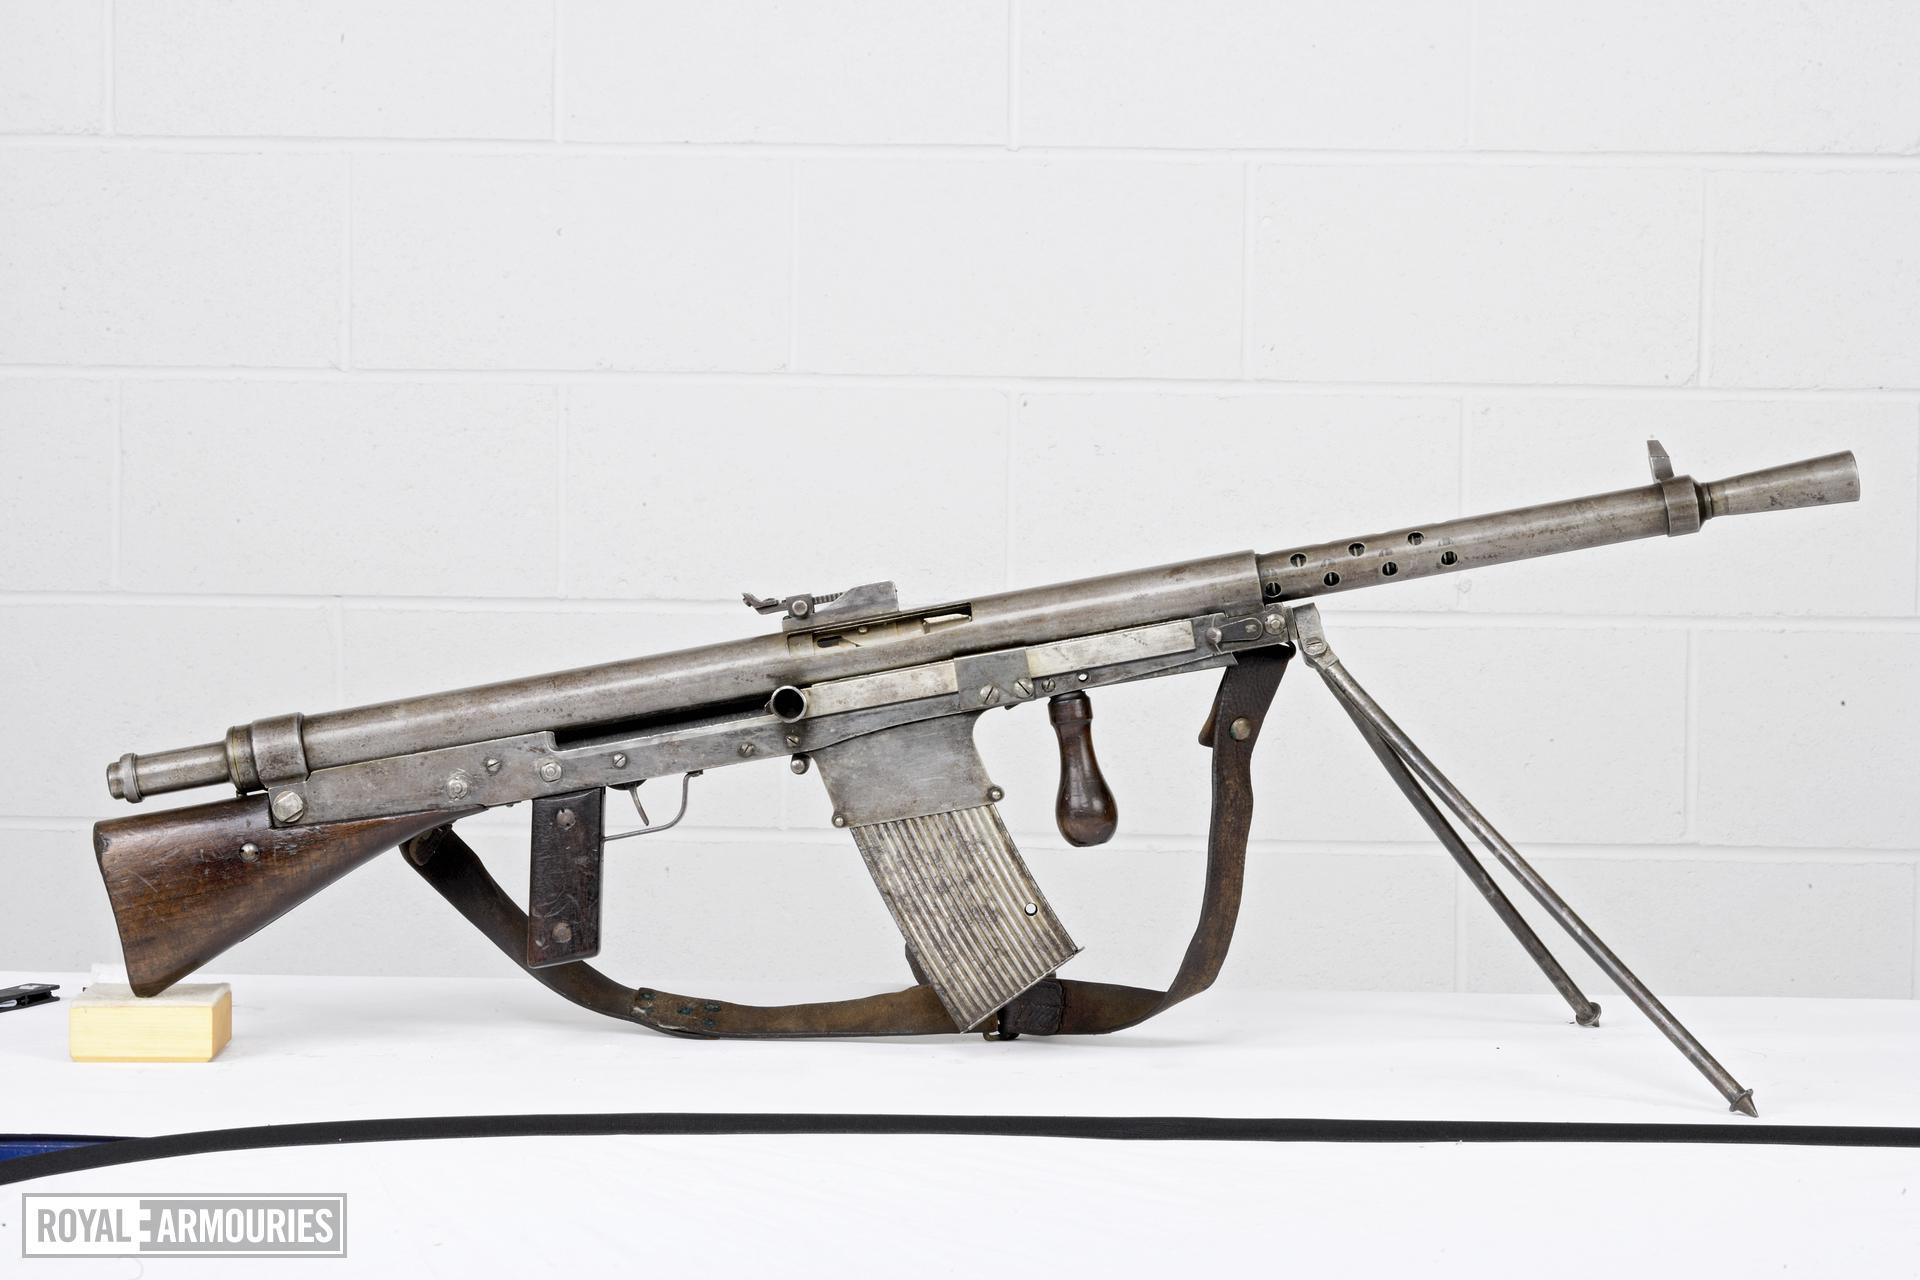 Centrefire automatic light machine gun - Chauchat Model 1918